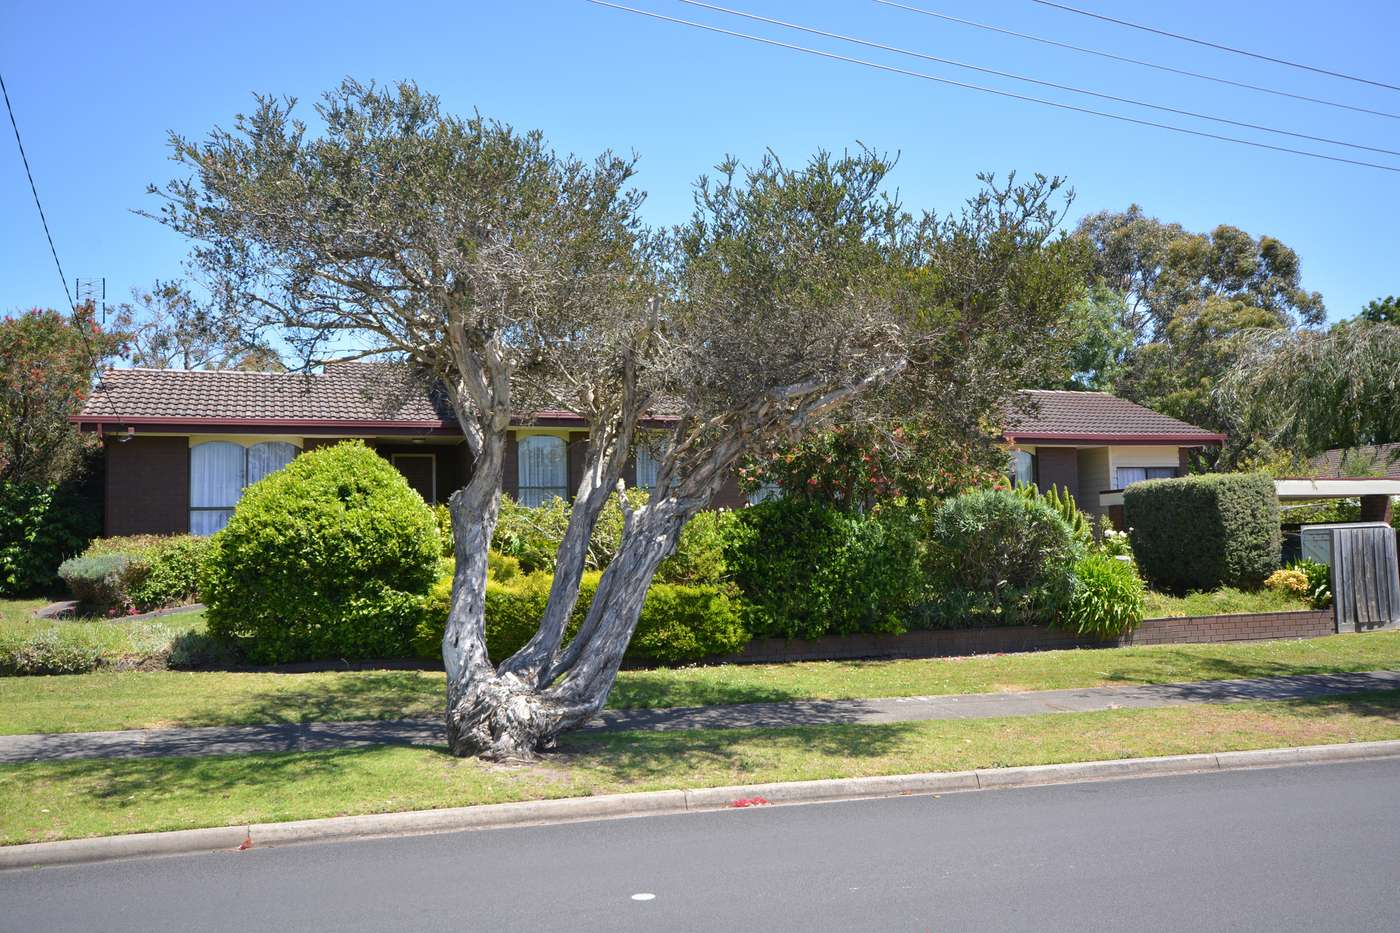 Main view of Homely house listing, 4 Brady Street, Portland, VIC 3305